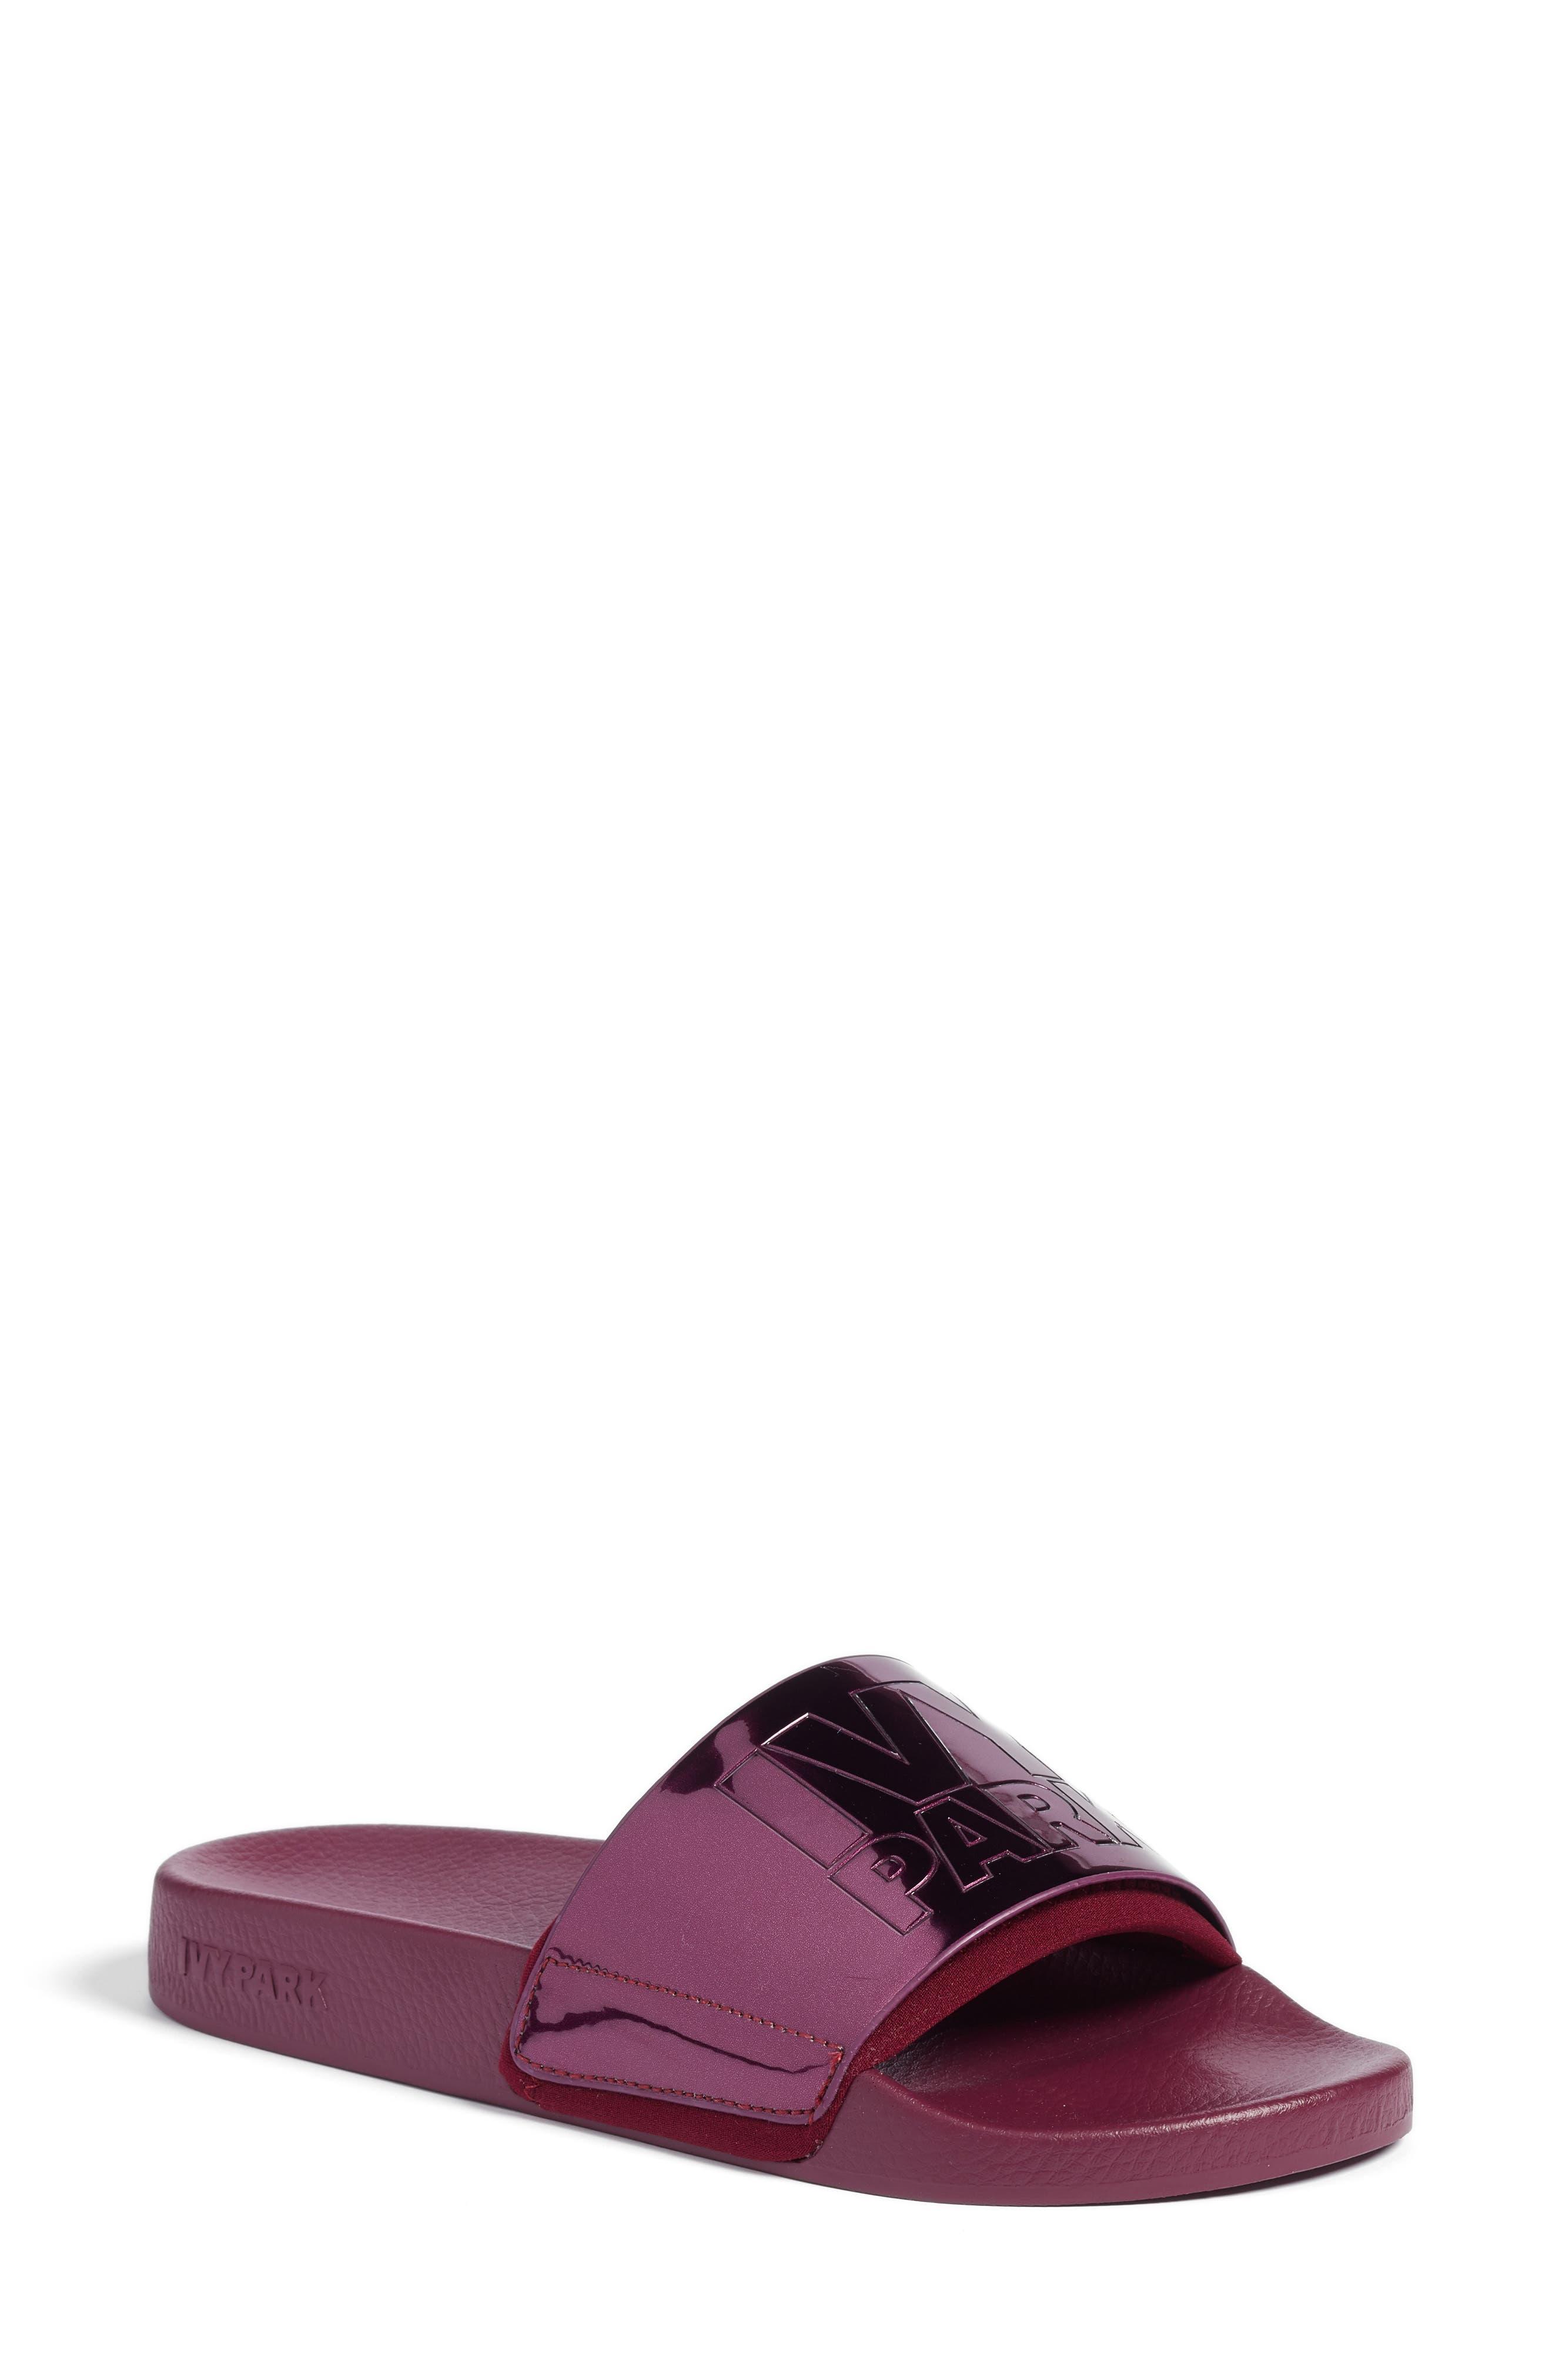 Slide Sandal,                             Main thumbnail 1, color,                             Plum